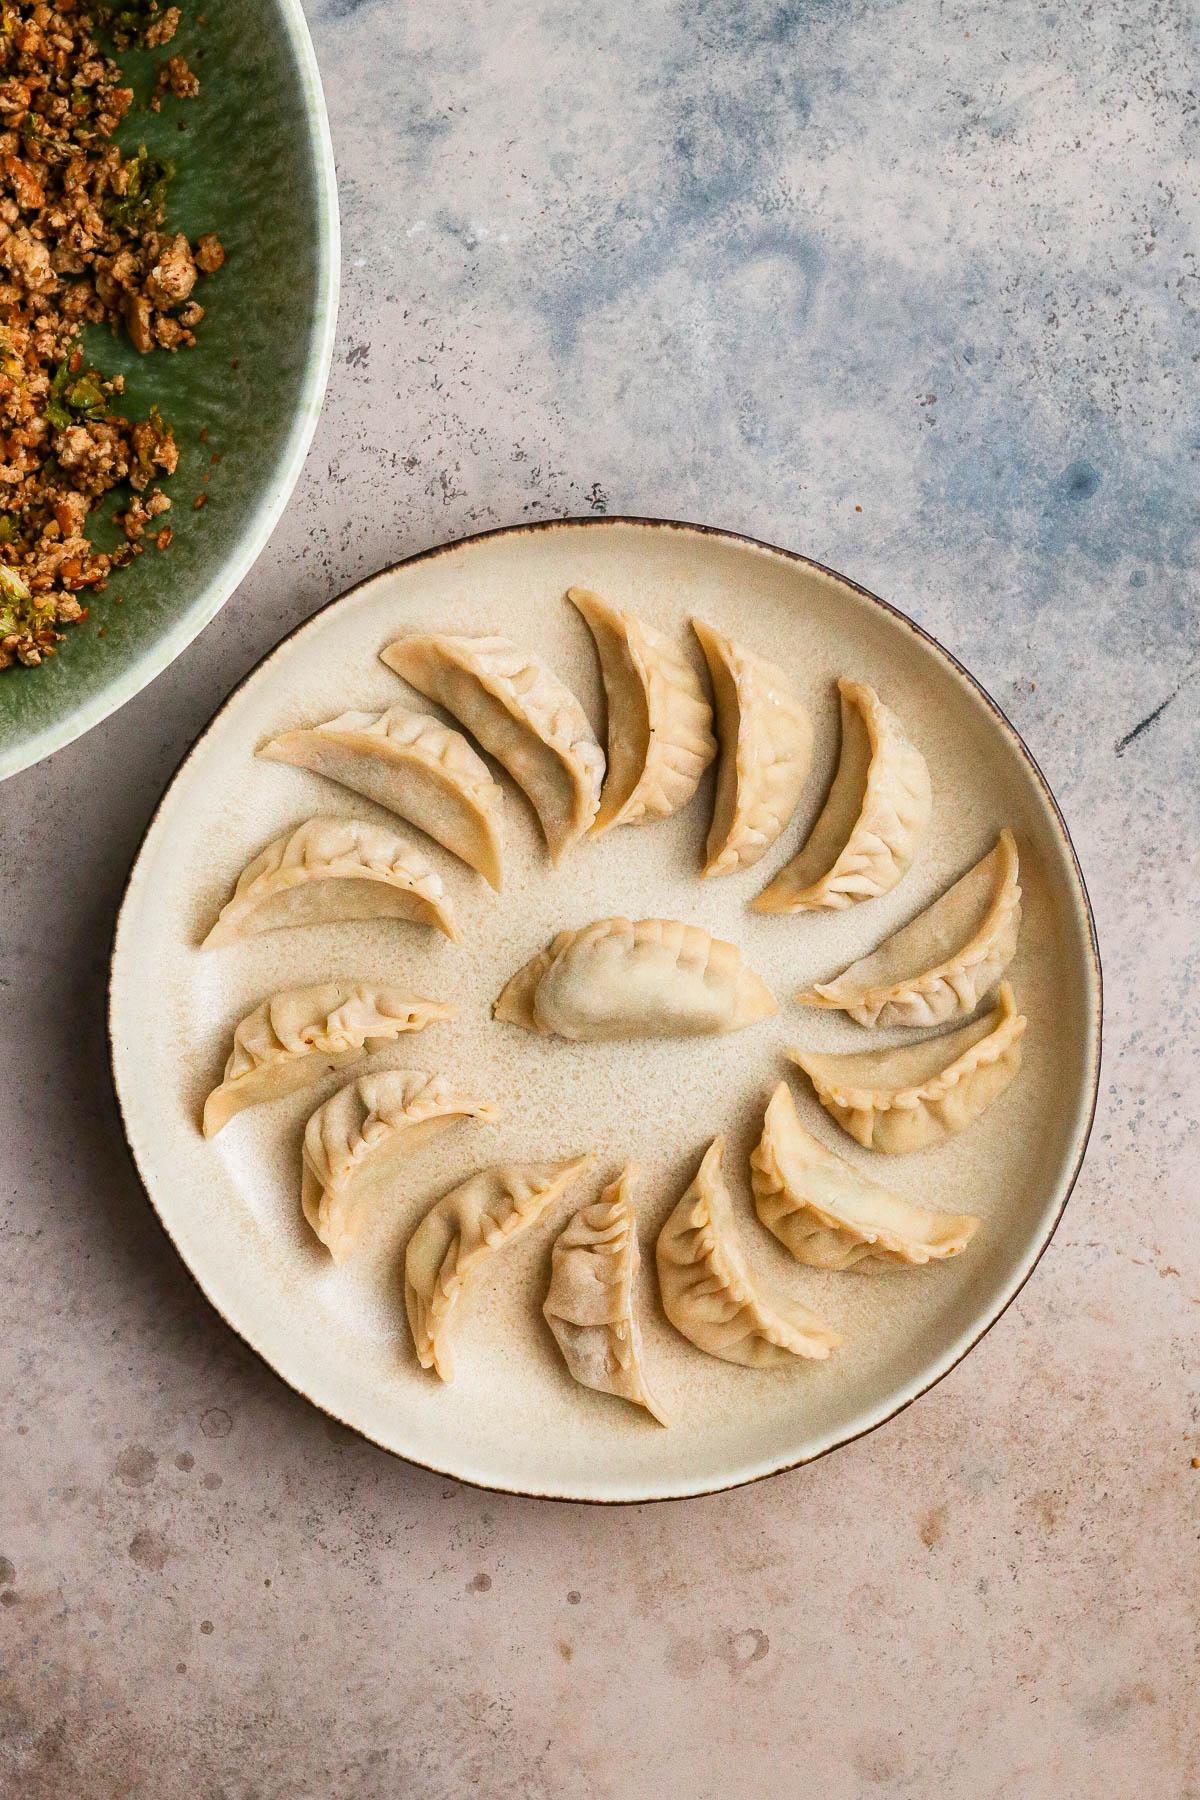 plate full of folded but uncooked dumplings.